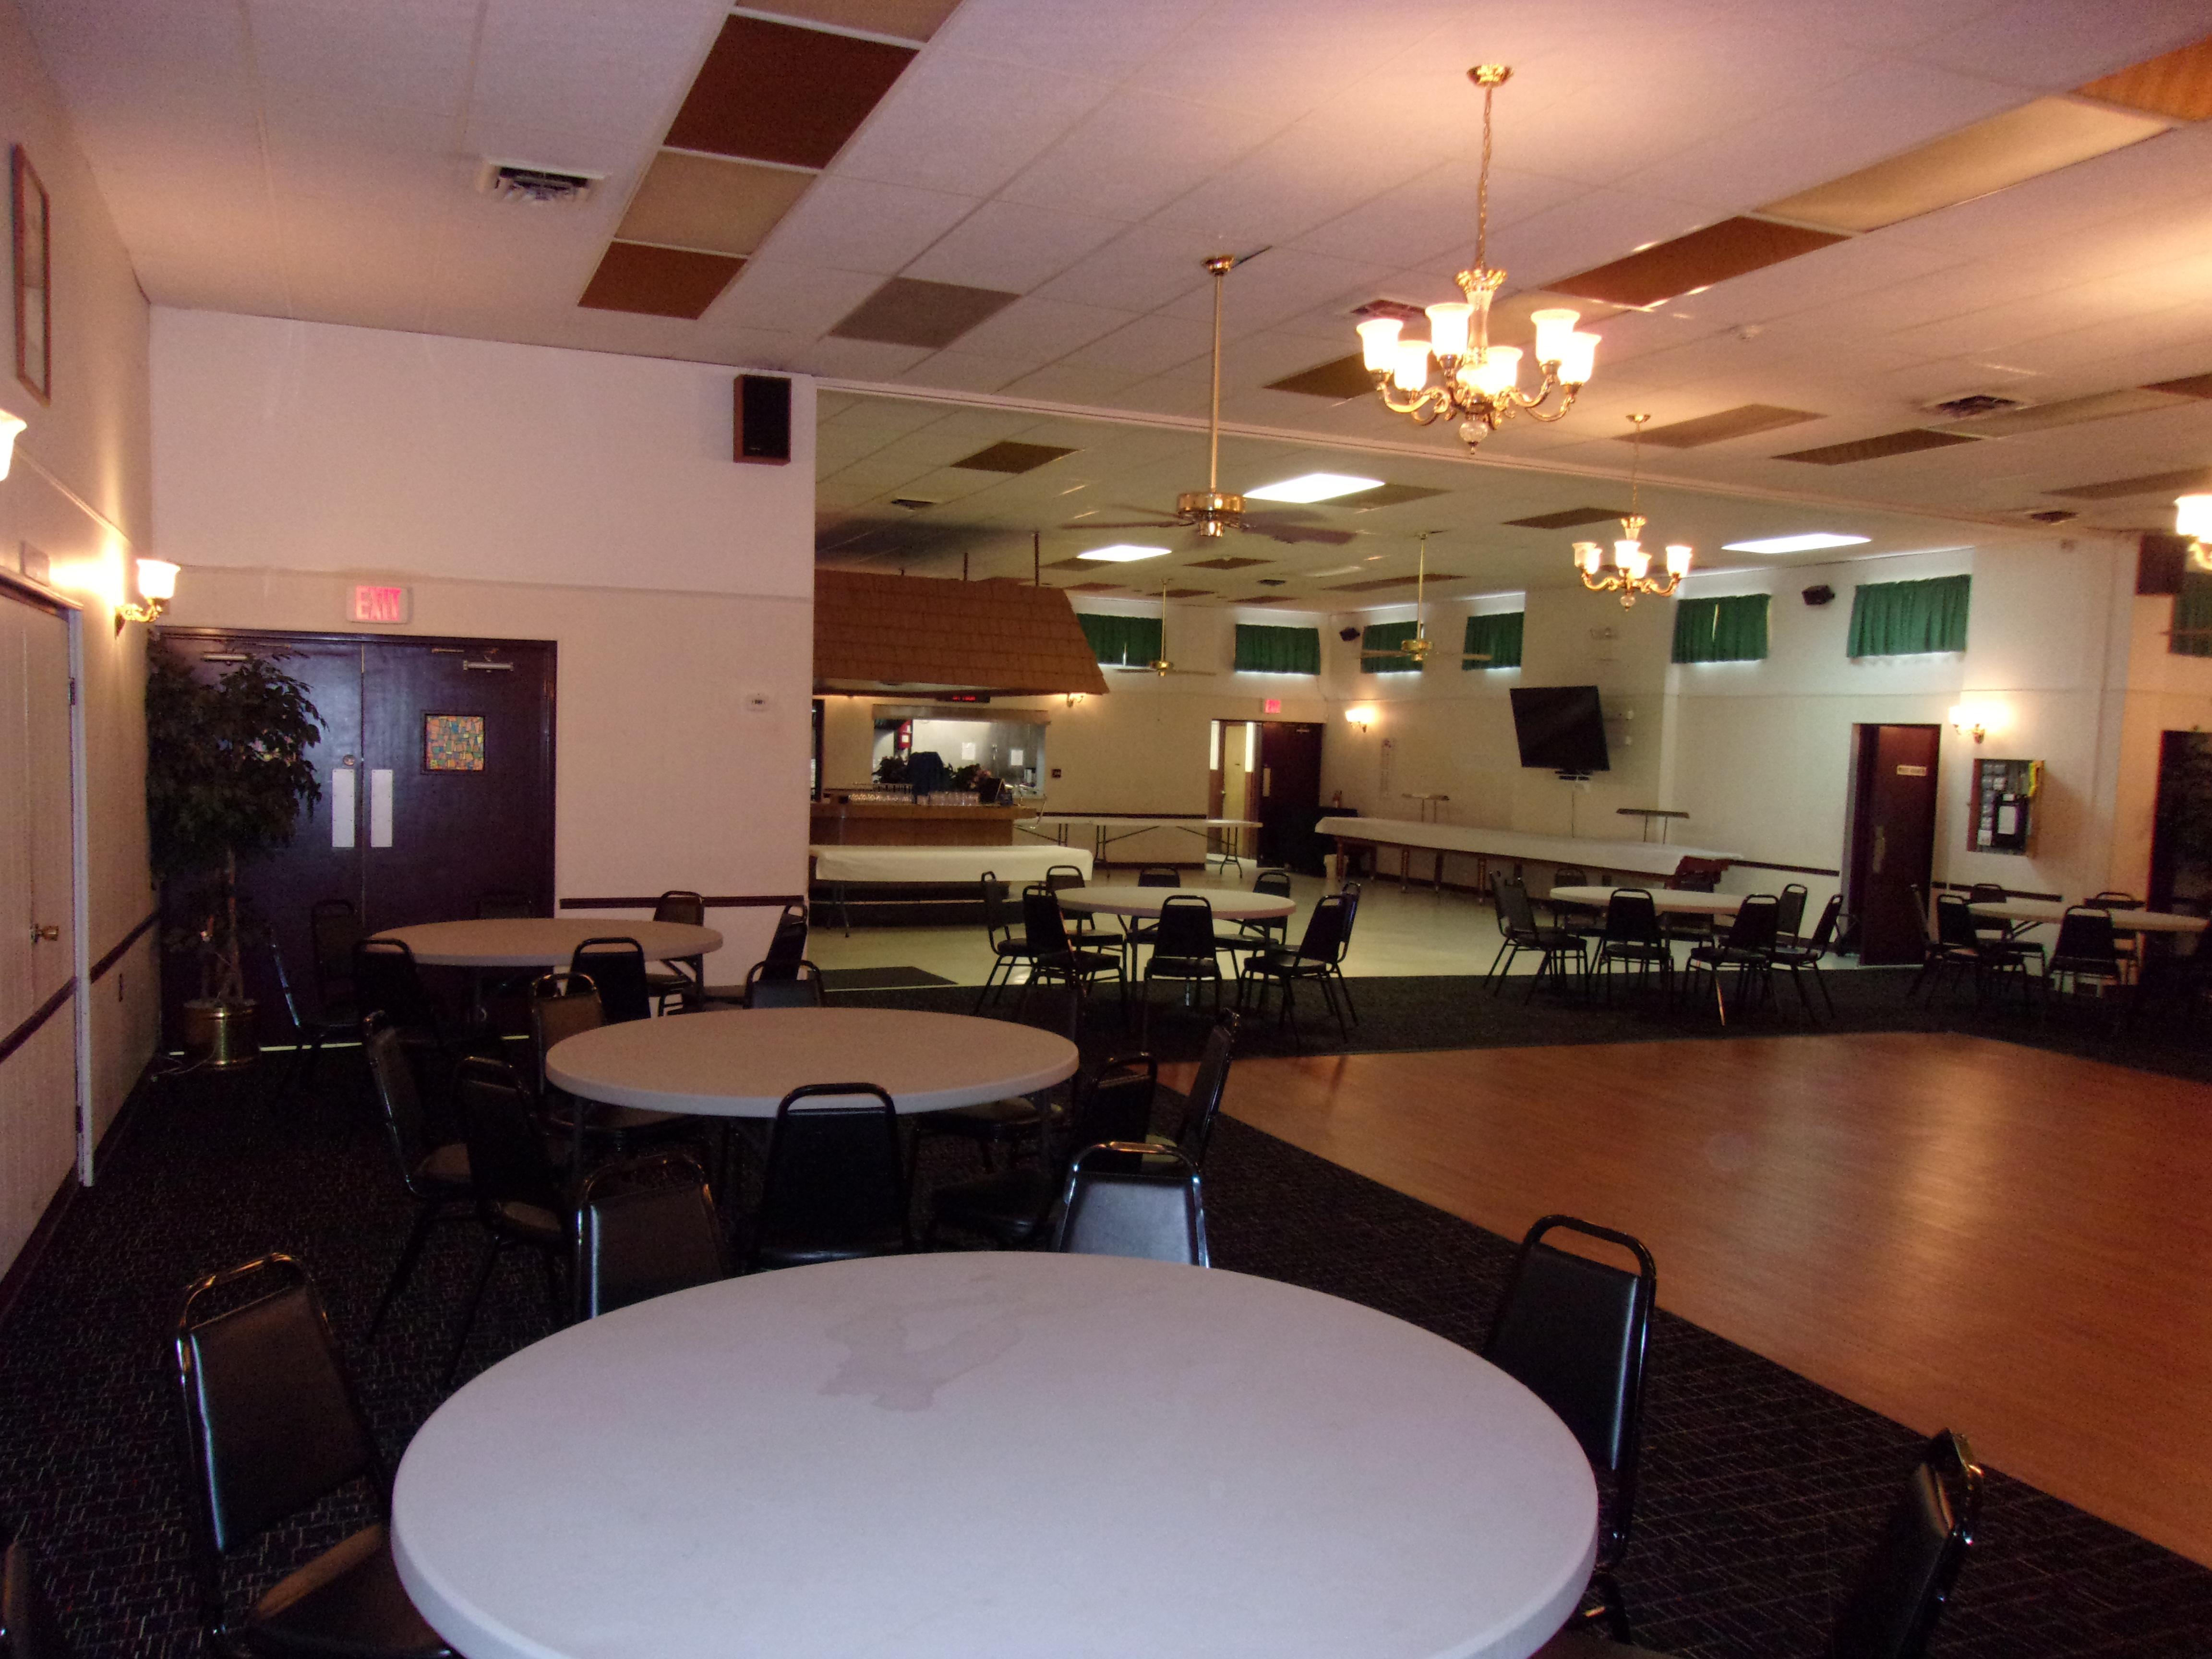 Air Conditioner Rental >> Knights of Columbus Council #1436 Hall Rentals in Delran, NJ